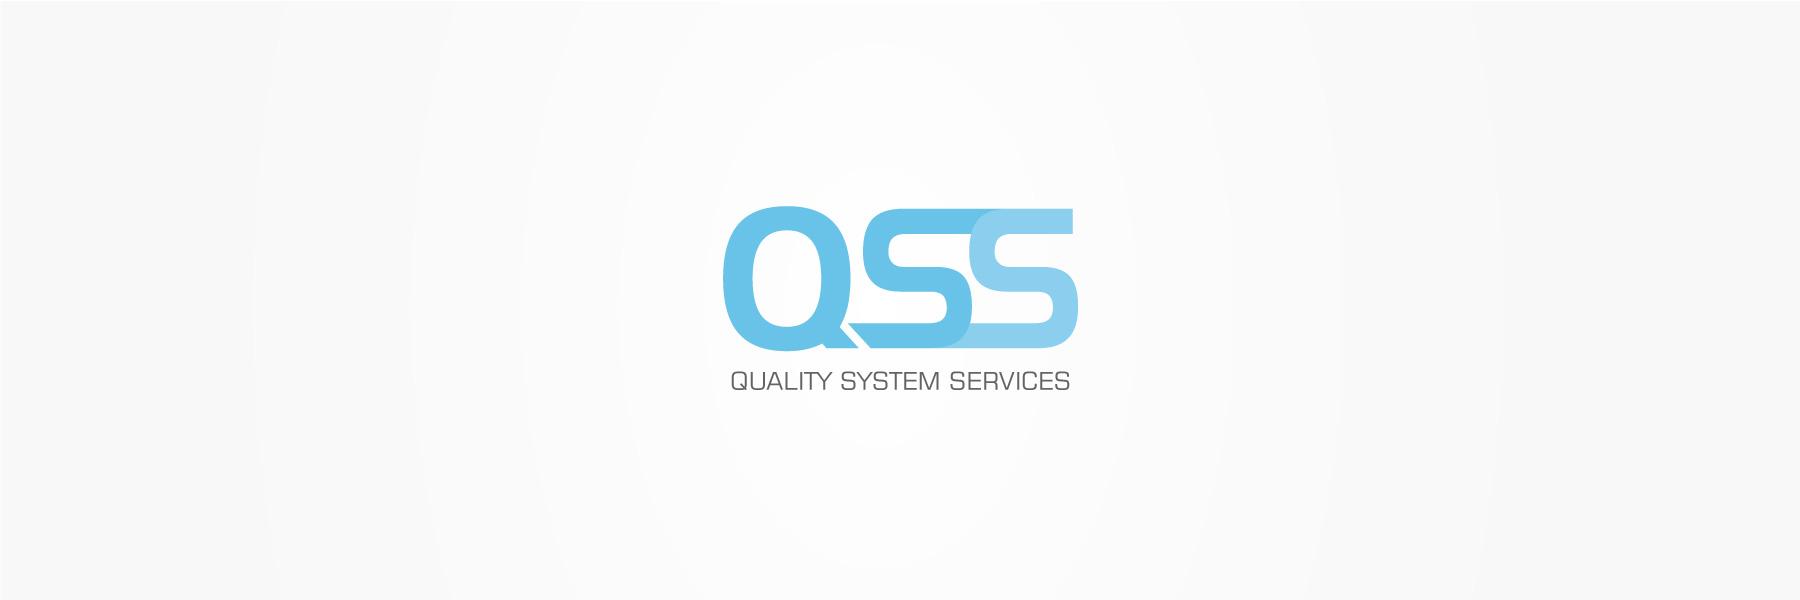 QSS-Quality-system-services-Logo-Design